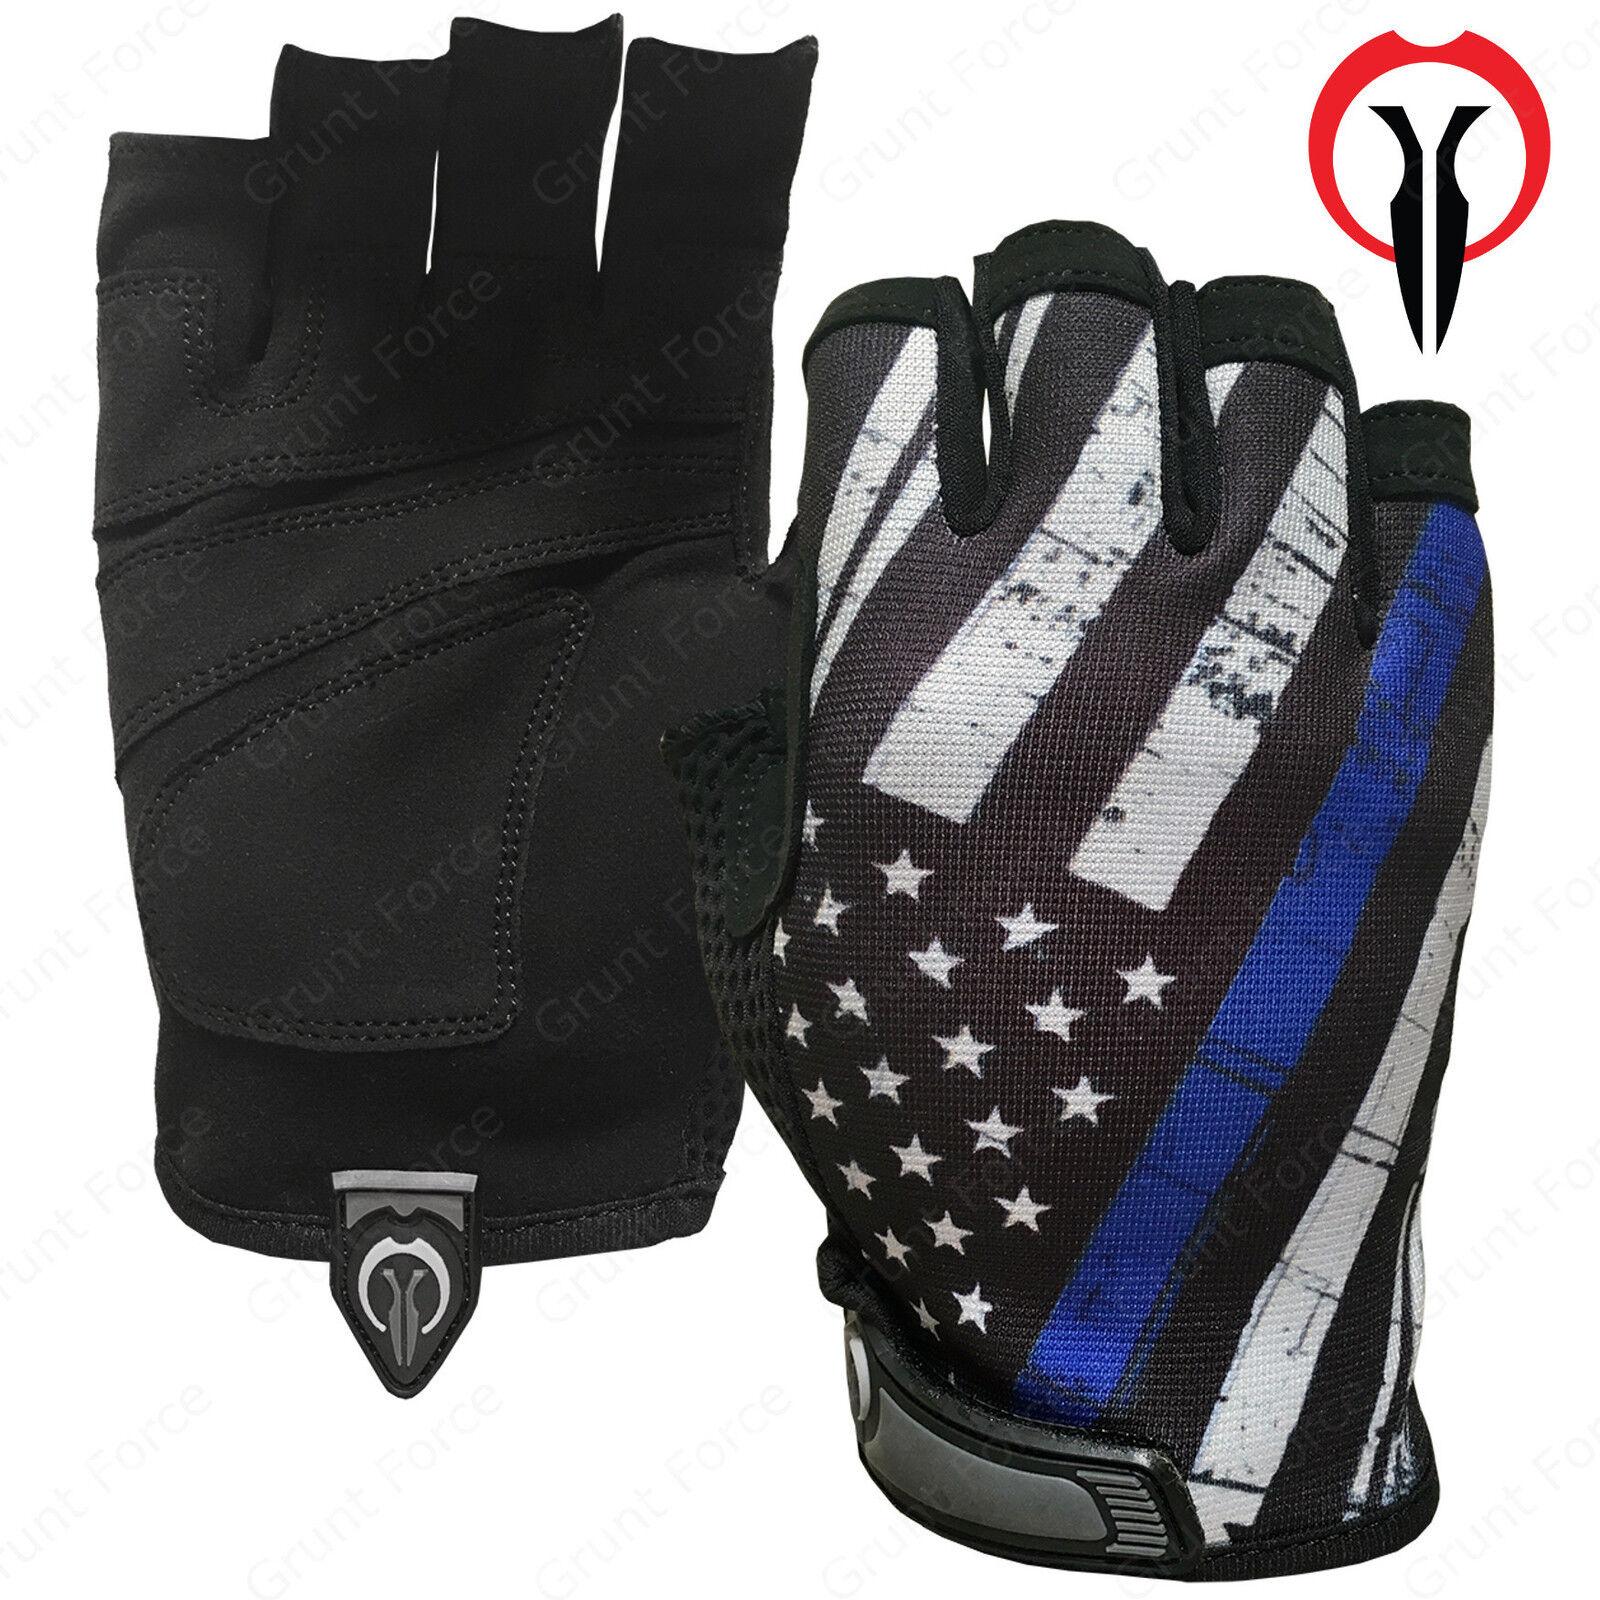 Industrious Handwear Thin Blue Line Half Finger Gloves - TBL Fingerless Gloves